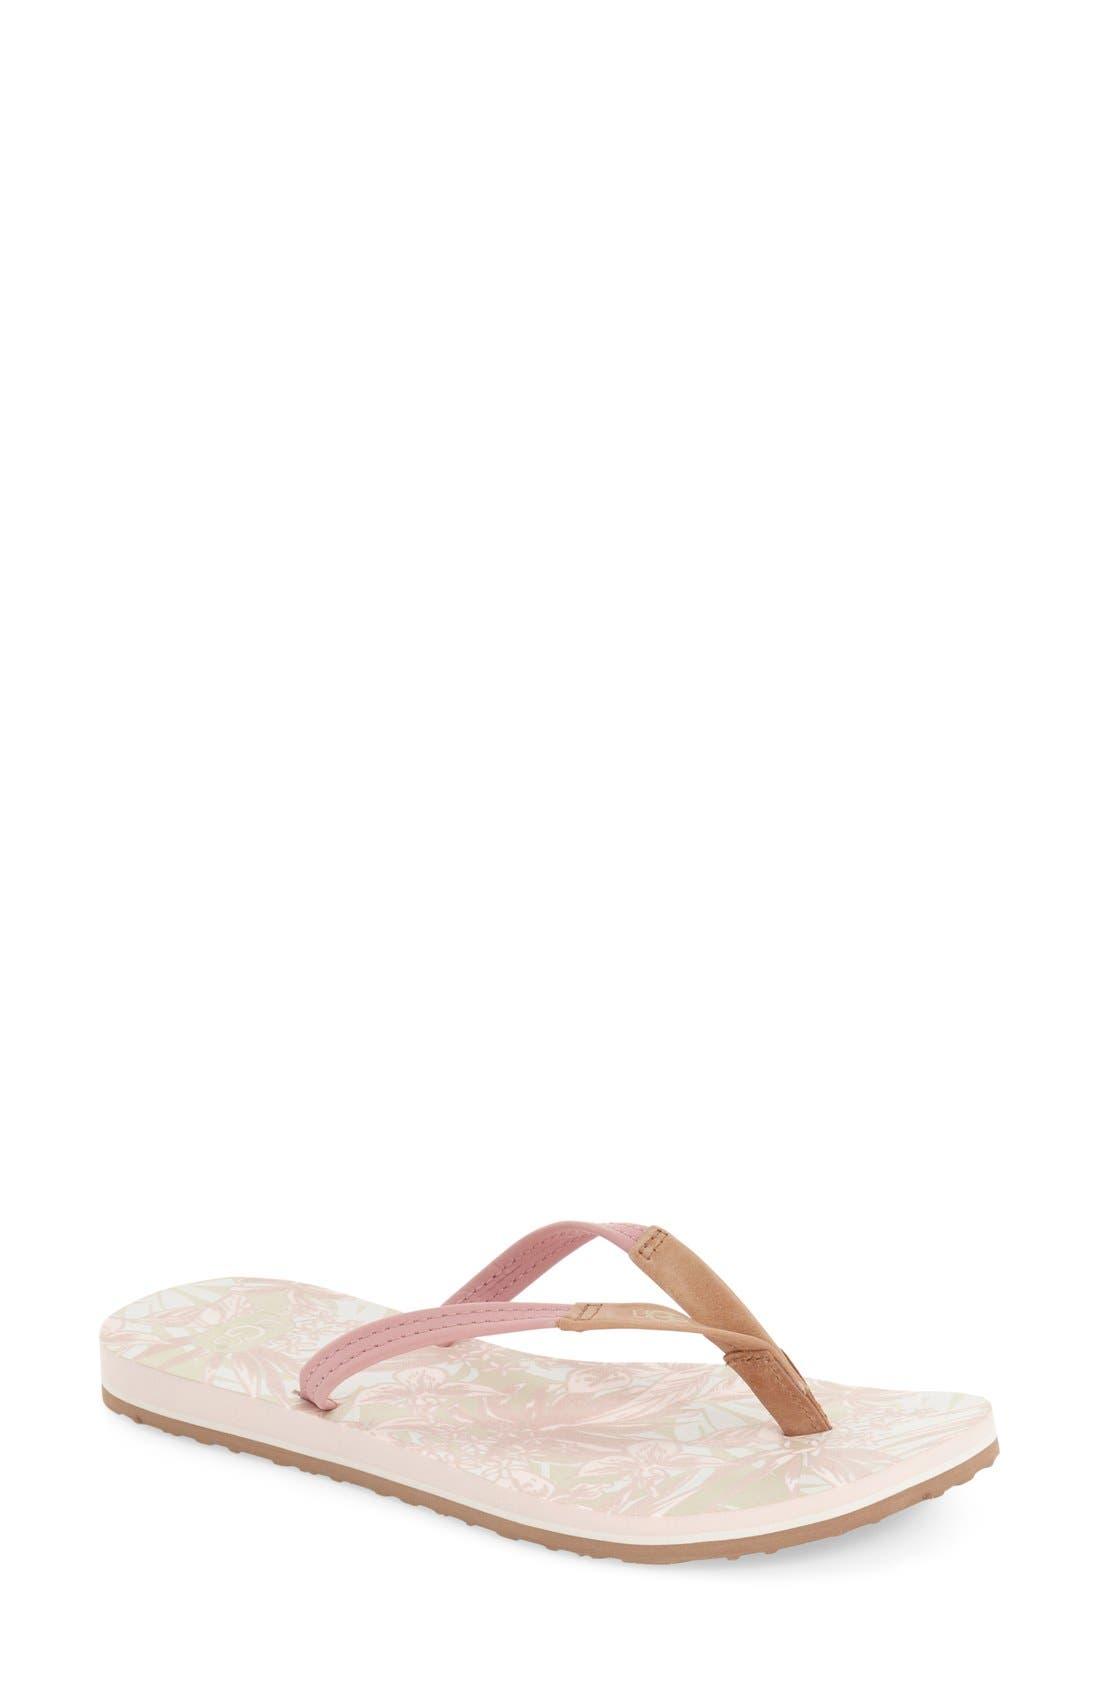 Alternate Image 1 Selected - UGG® 'Magnolia Island' Flip Flop (Women)